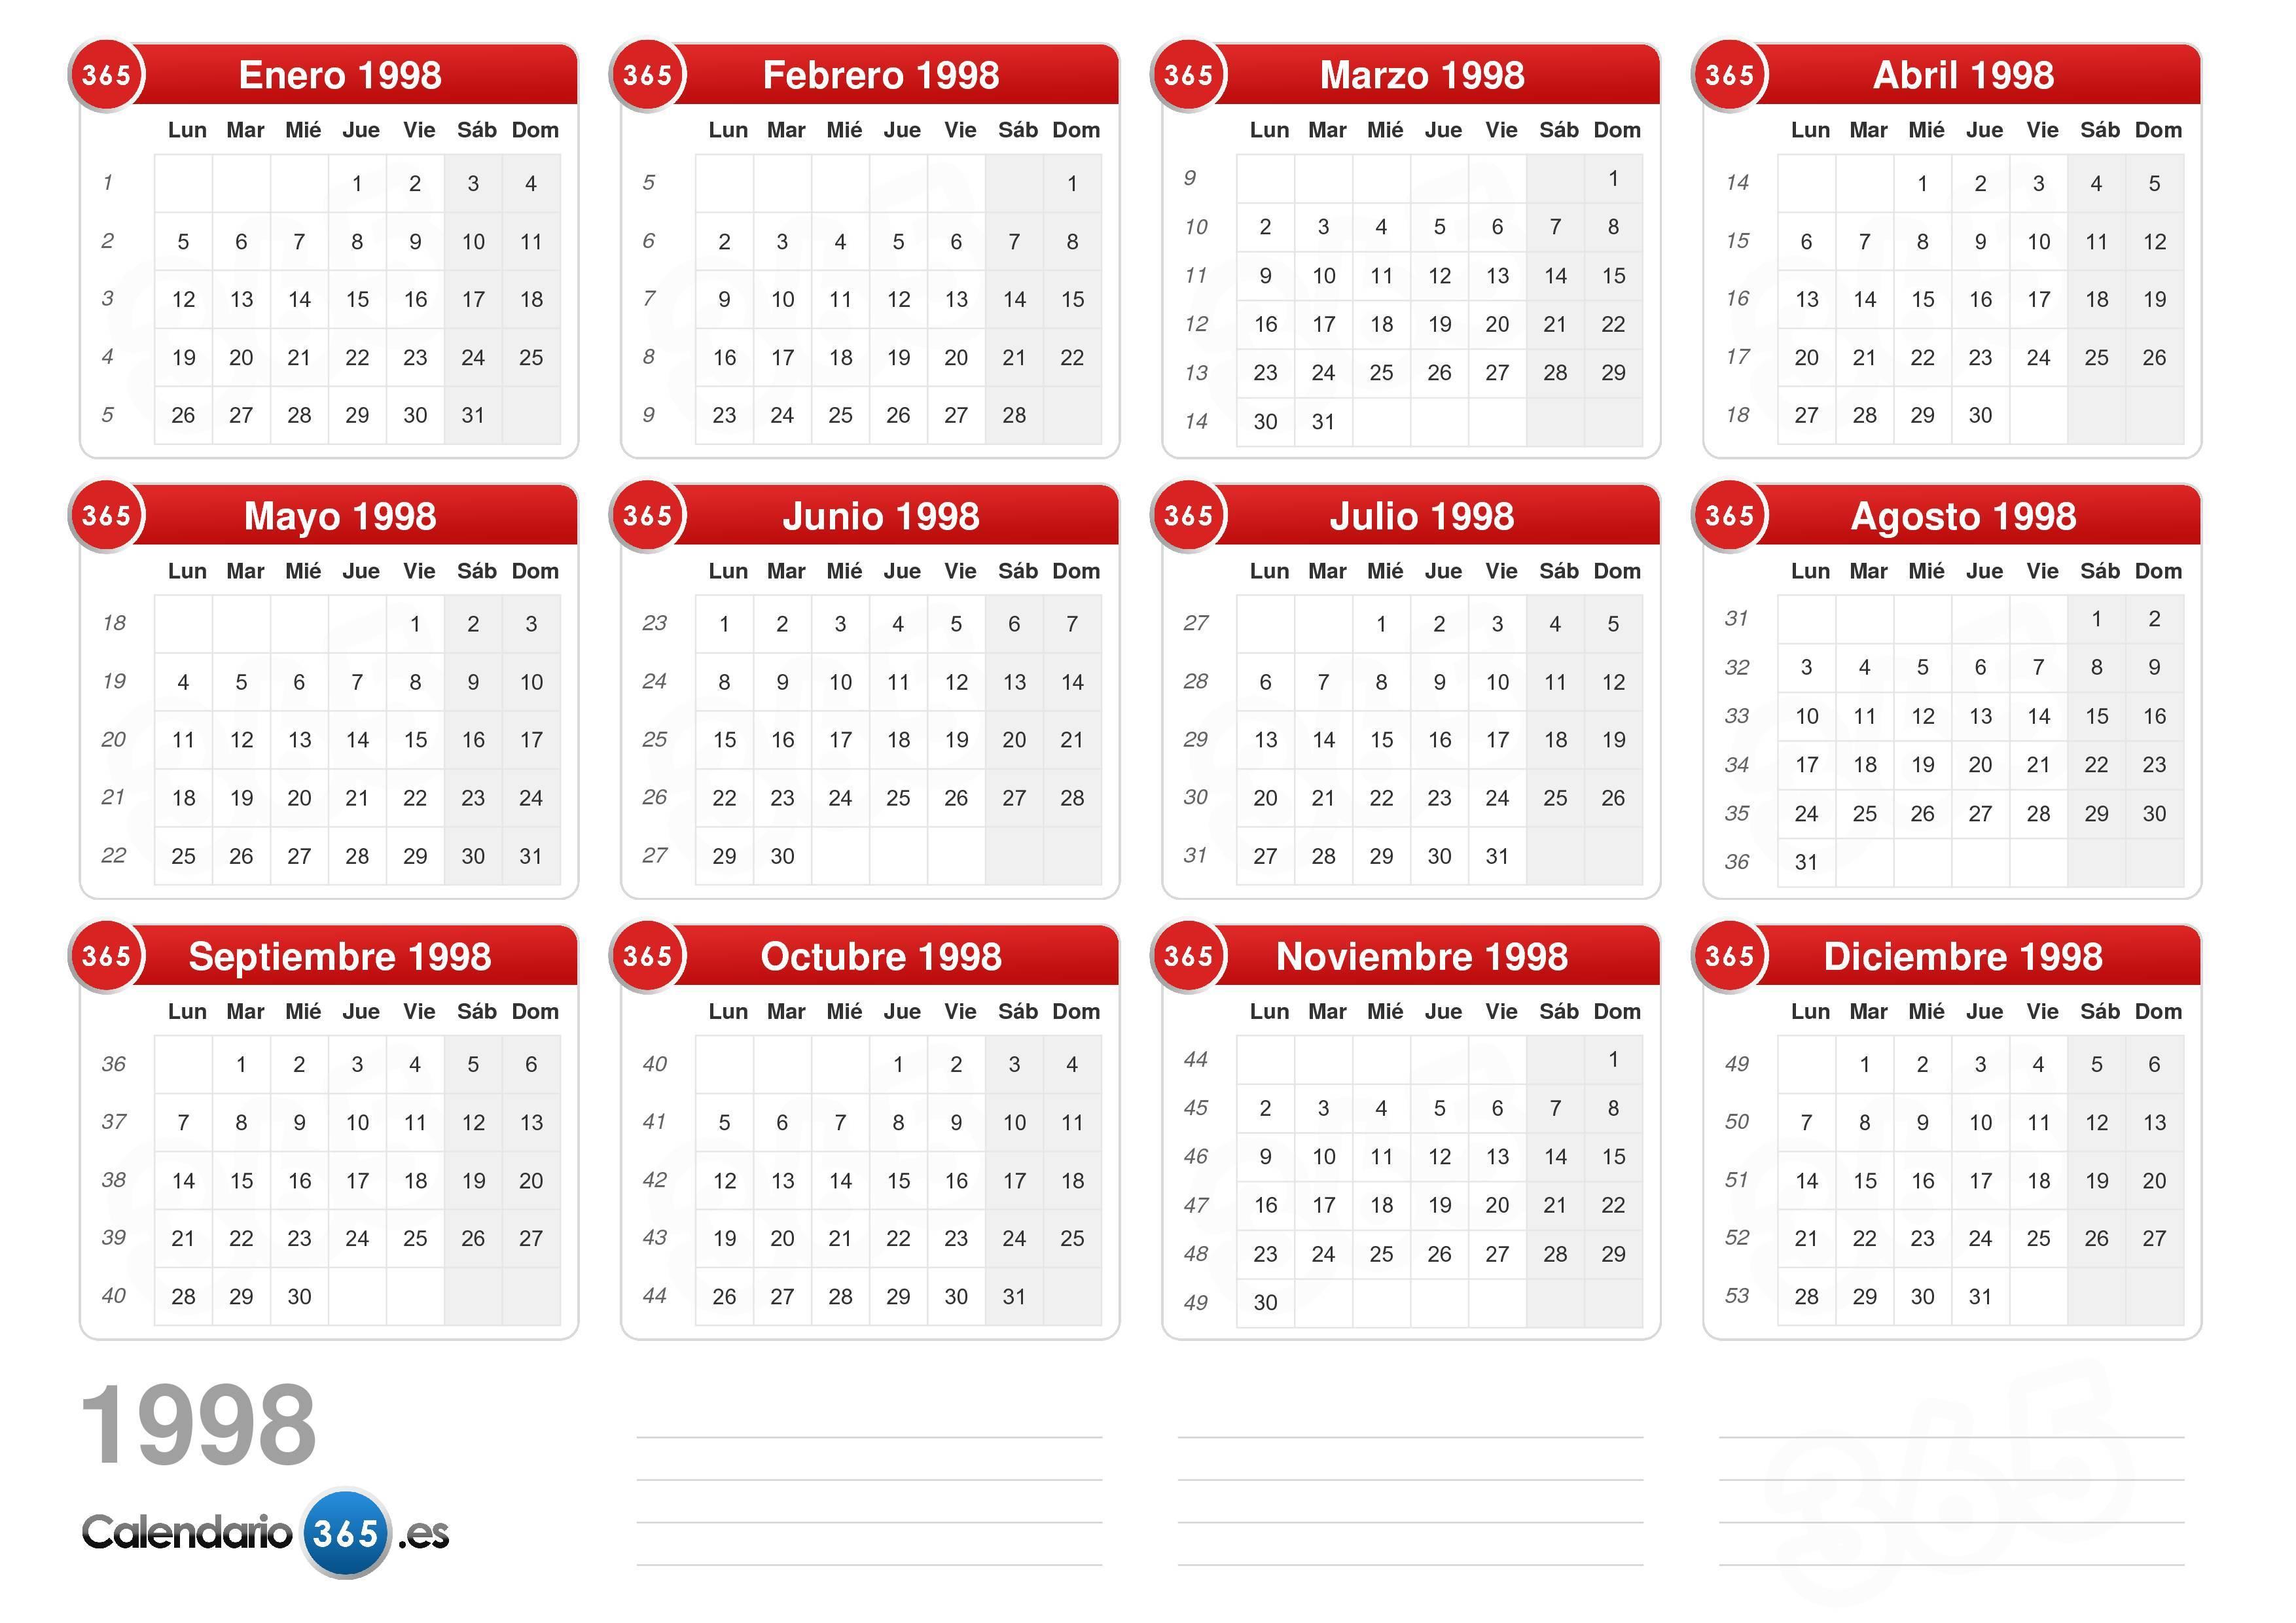 1998 Calendario.Calendario 1998 Watershowspeakers